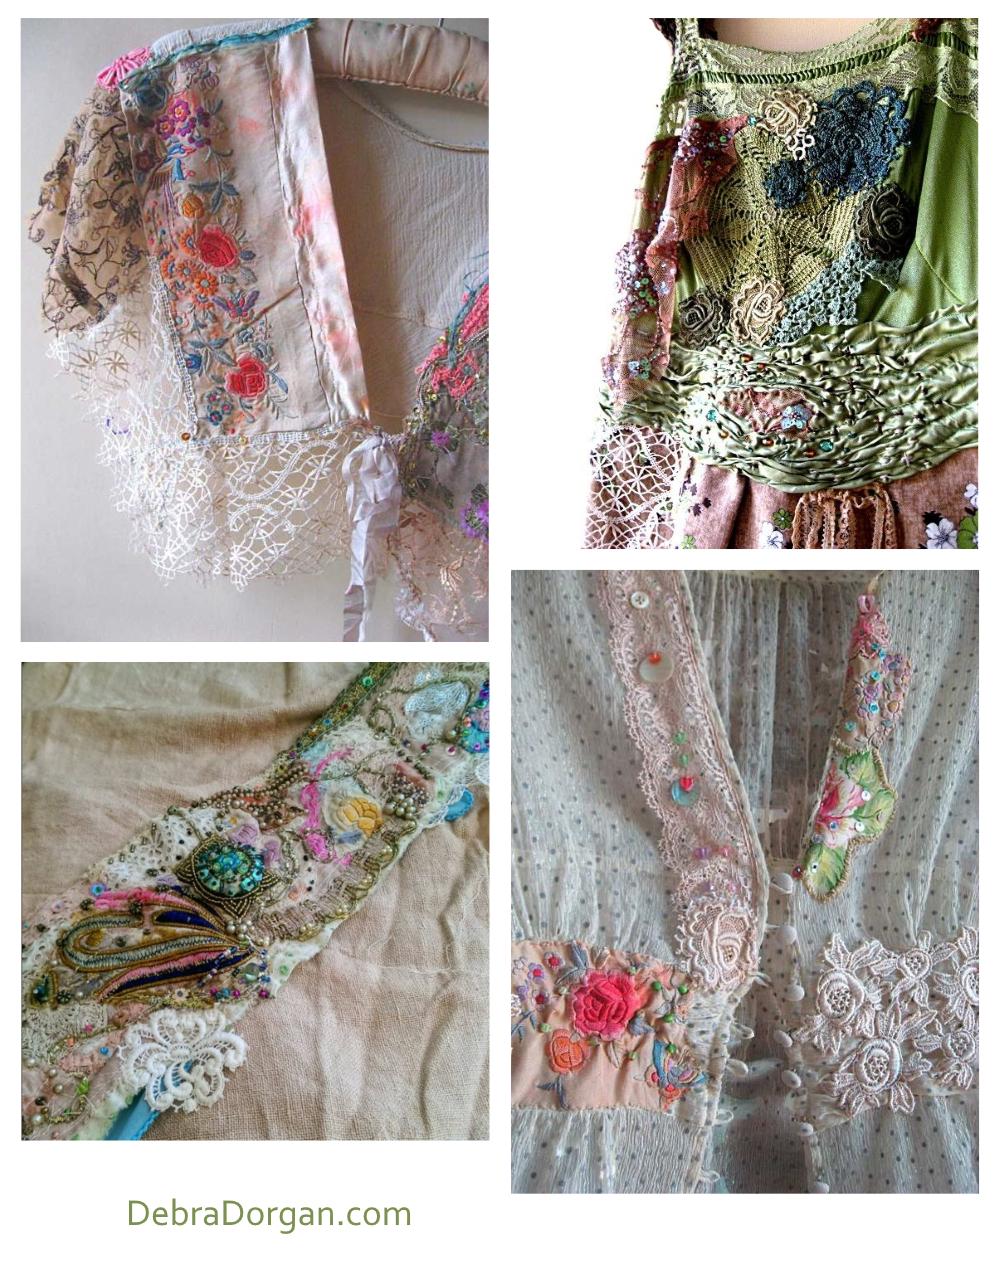 Textures and Textiles by Debra Dorgan - AllThingsPretty on Etsy. Australia